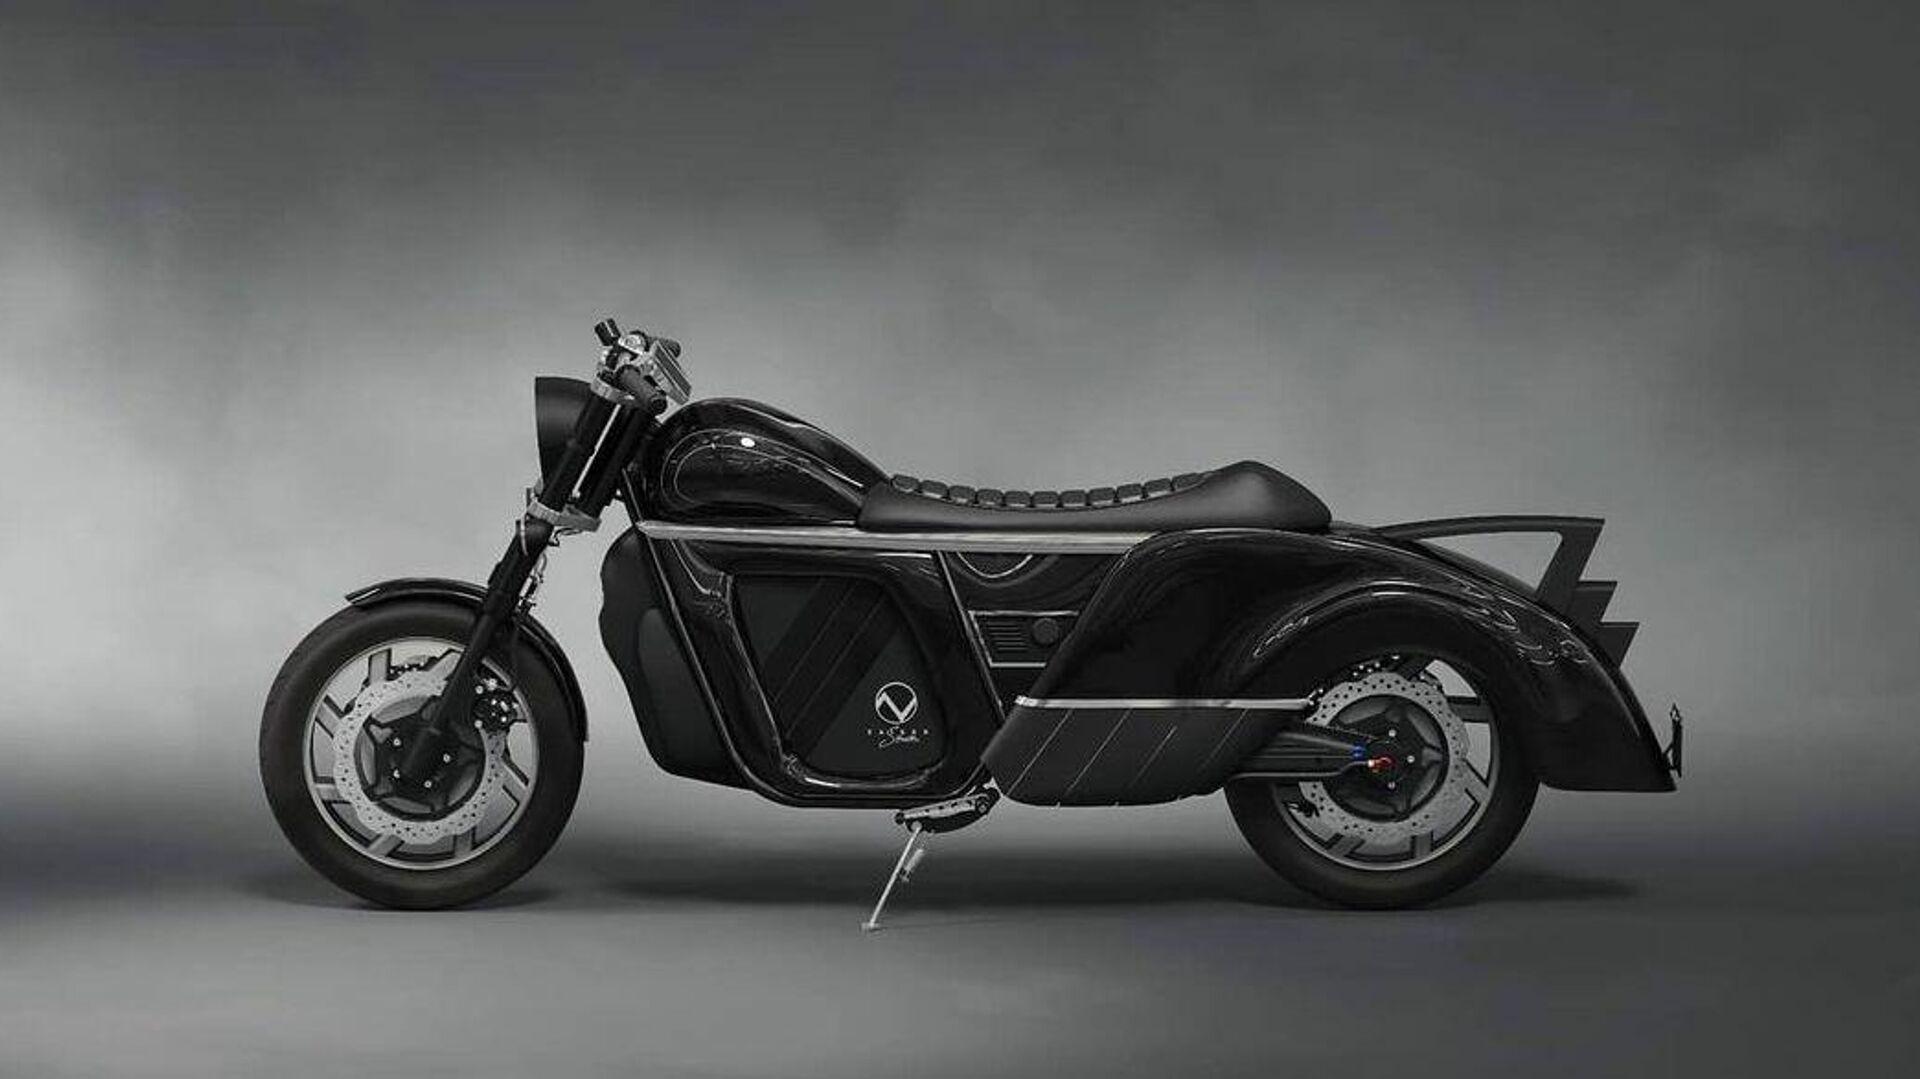 Electrocycle, la motocicleta eléctrica retro de Zaiser Motors - Sputnik Mundo, 1920, 03.06.2021